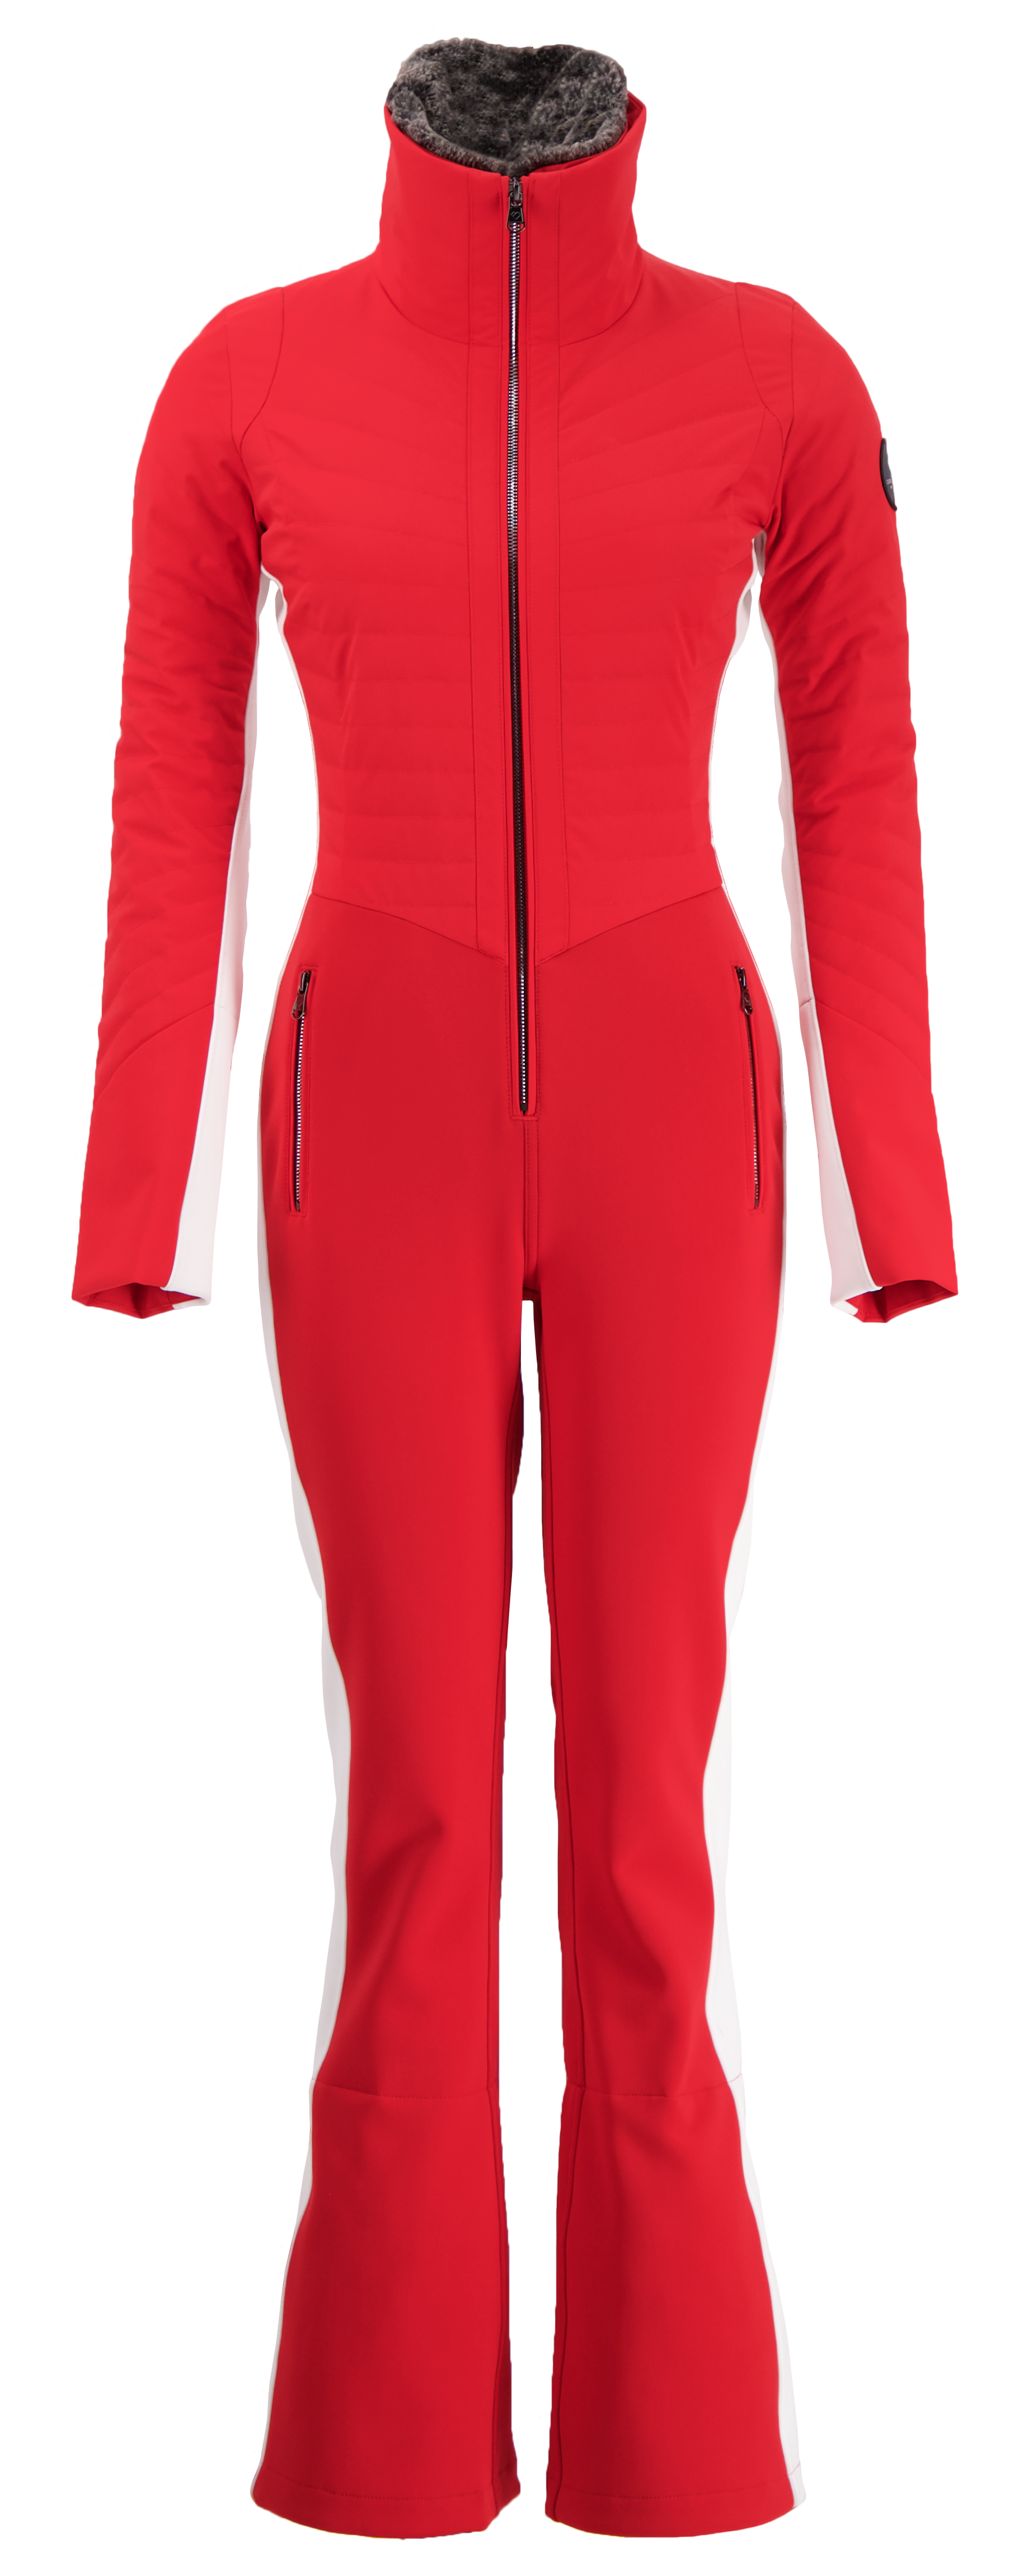 Mikaela Shiffrin World Championship Slalom